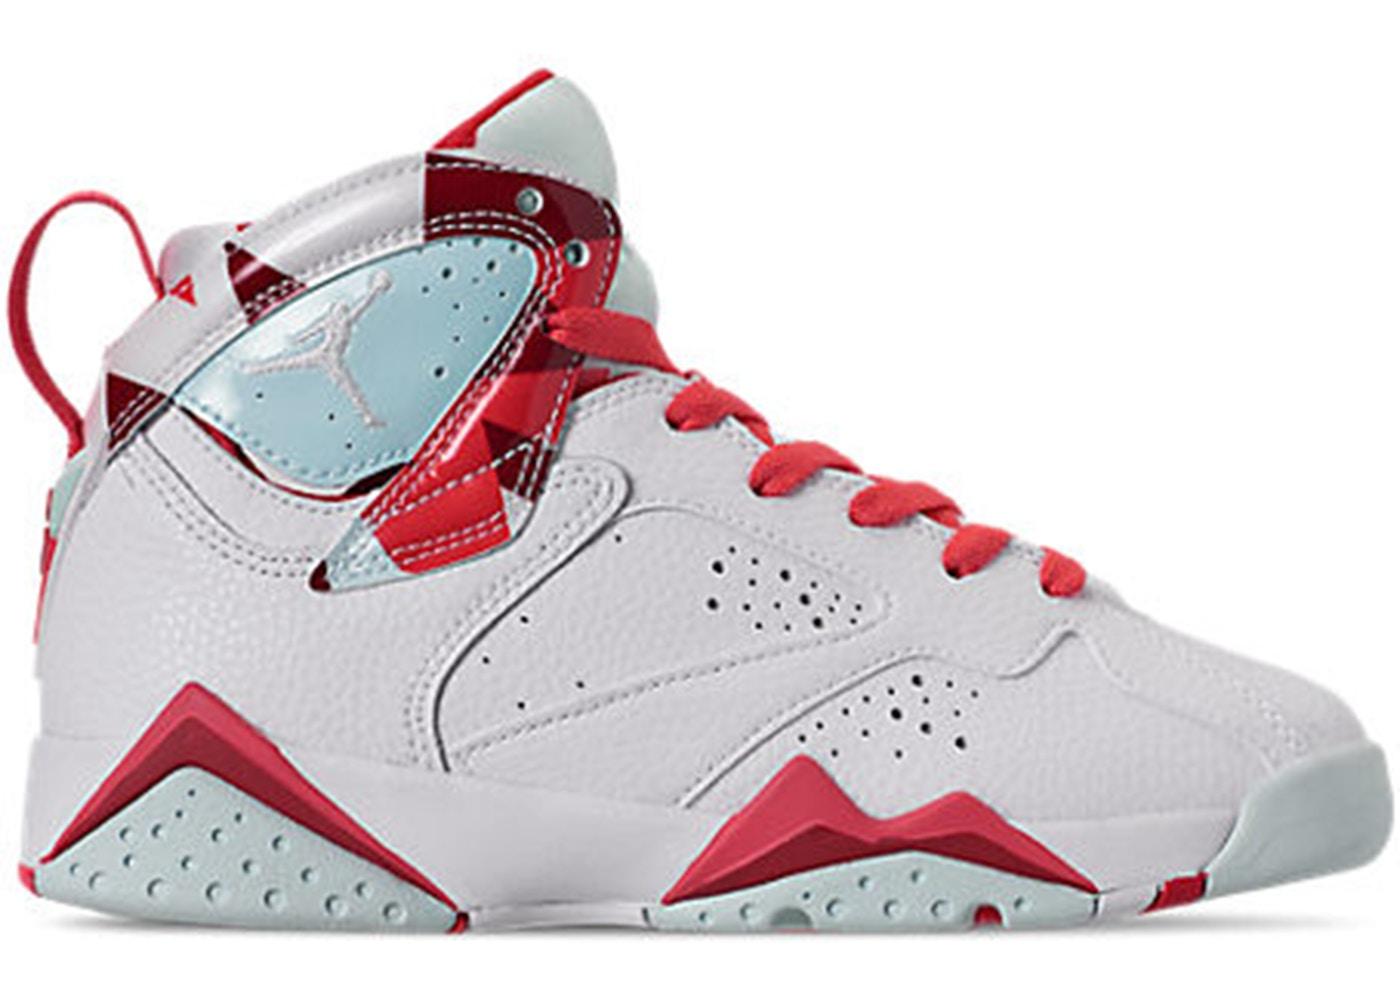 a0fc463d8a36d9 Buy Air Jordan 7 Shoes   Deadstock Sneakers